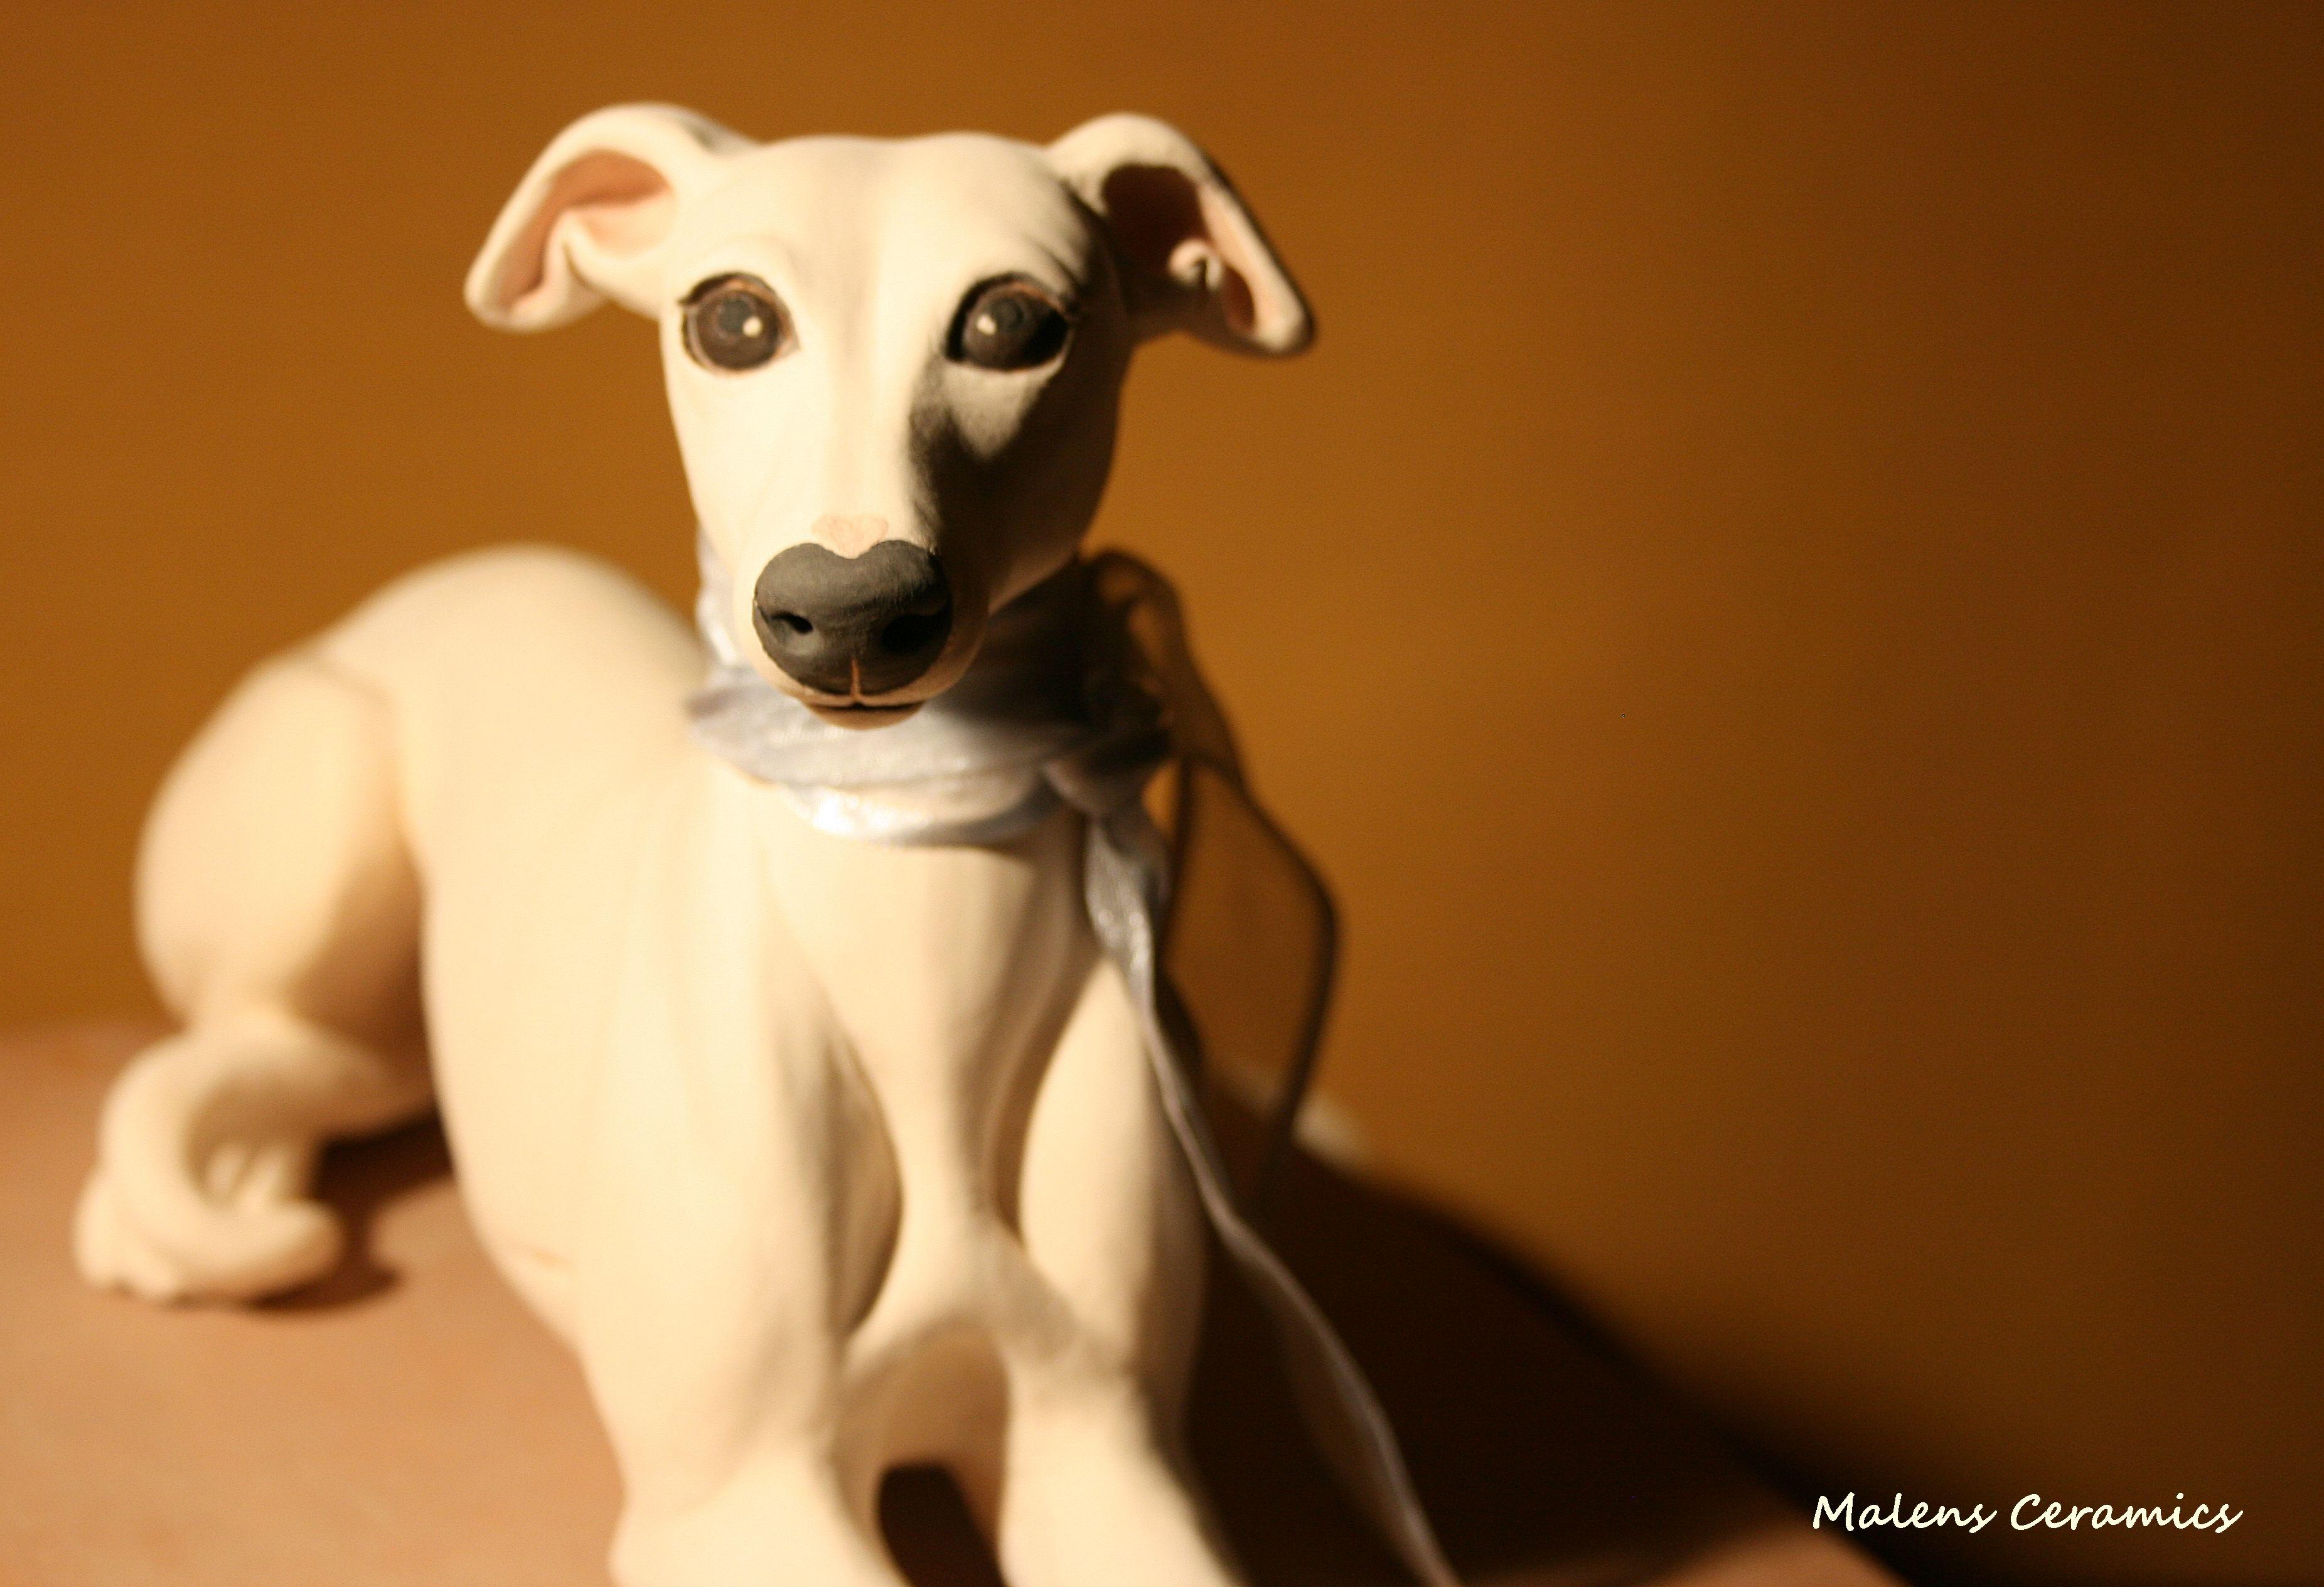 Hungarian Greyhound Ceramic Sculpture By Malens Ceramics